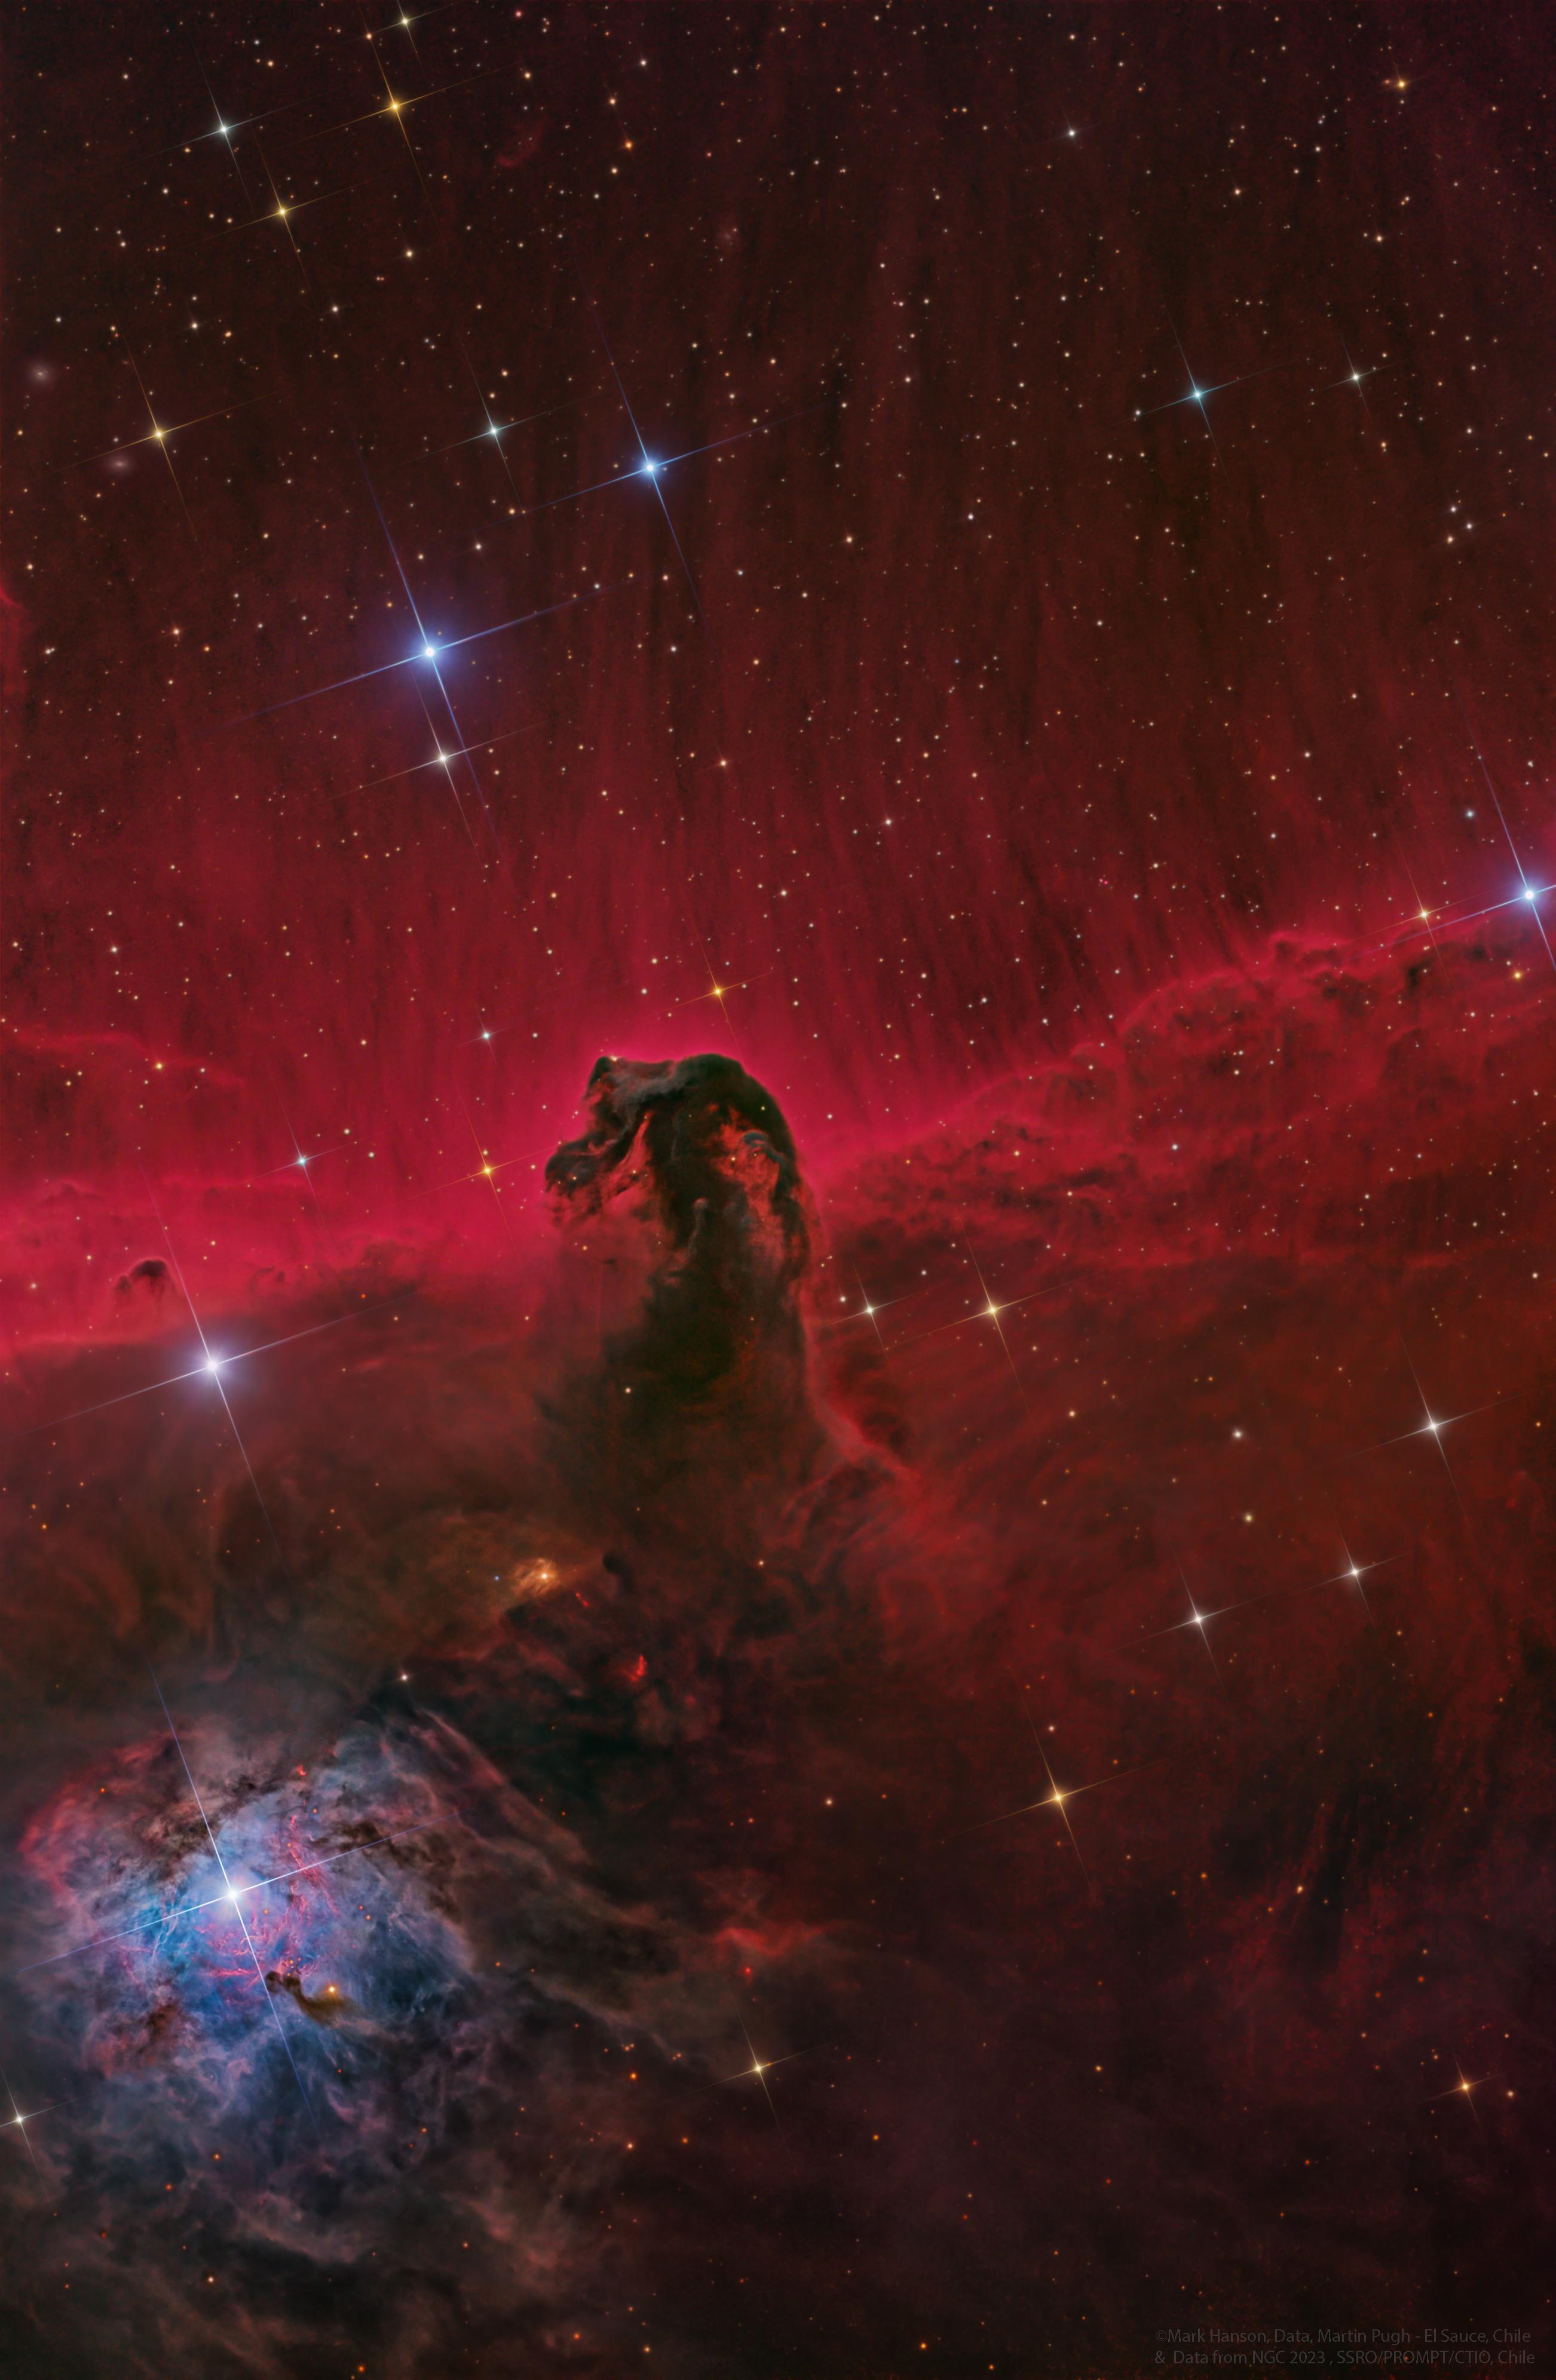 APOD: 2019 December 17 - The Horsehead Nebula